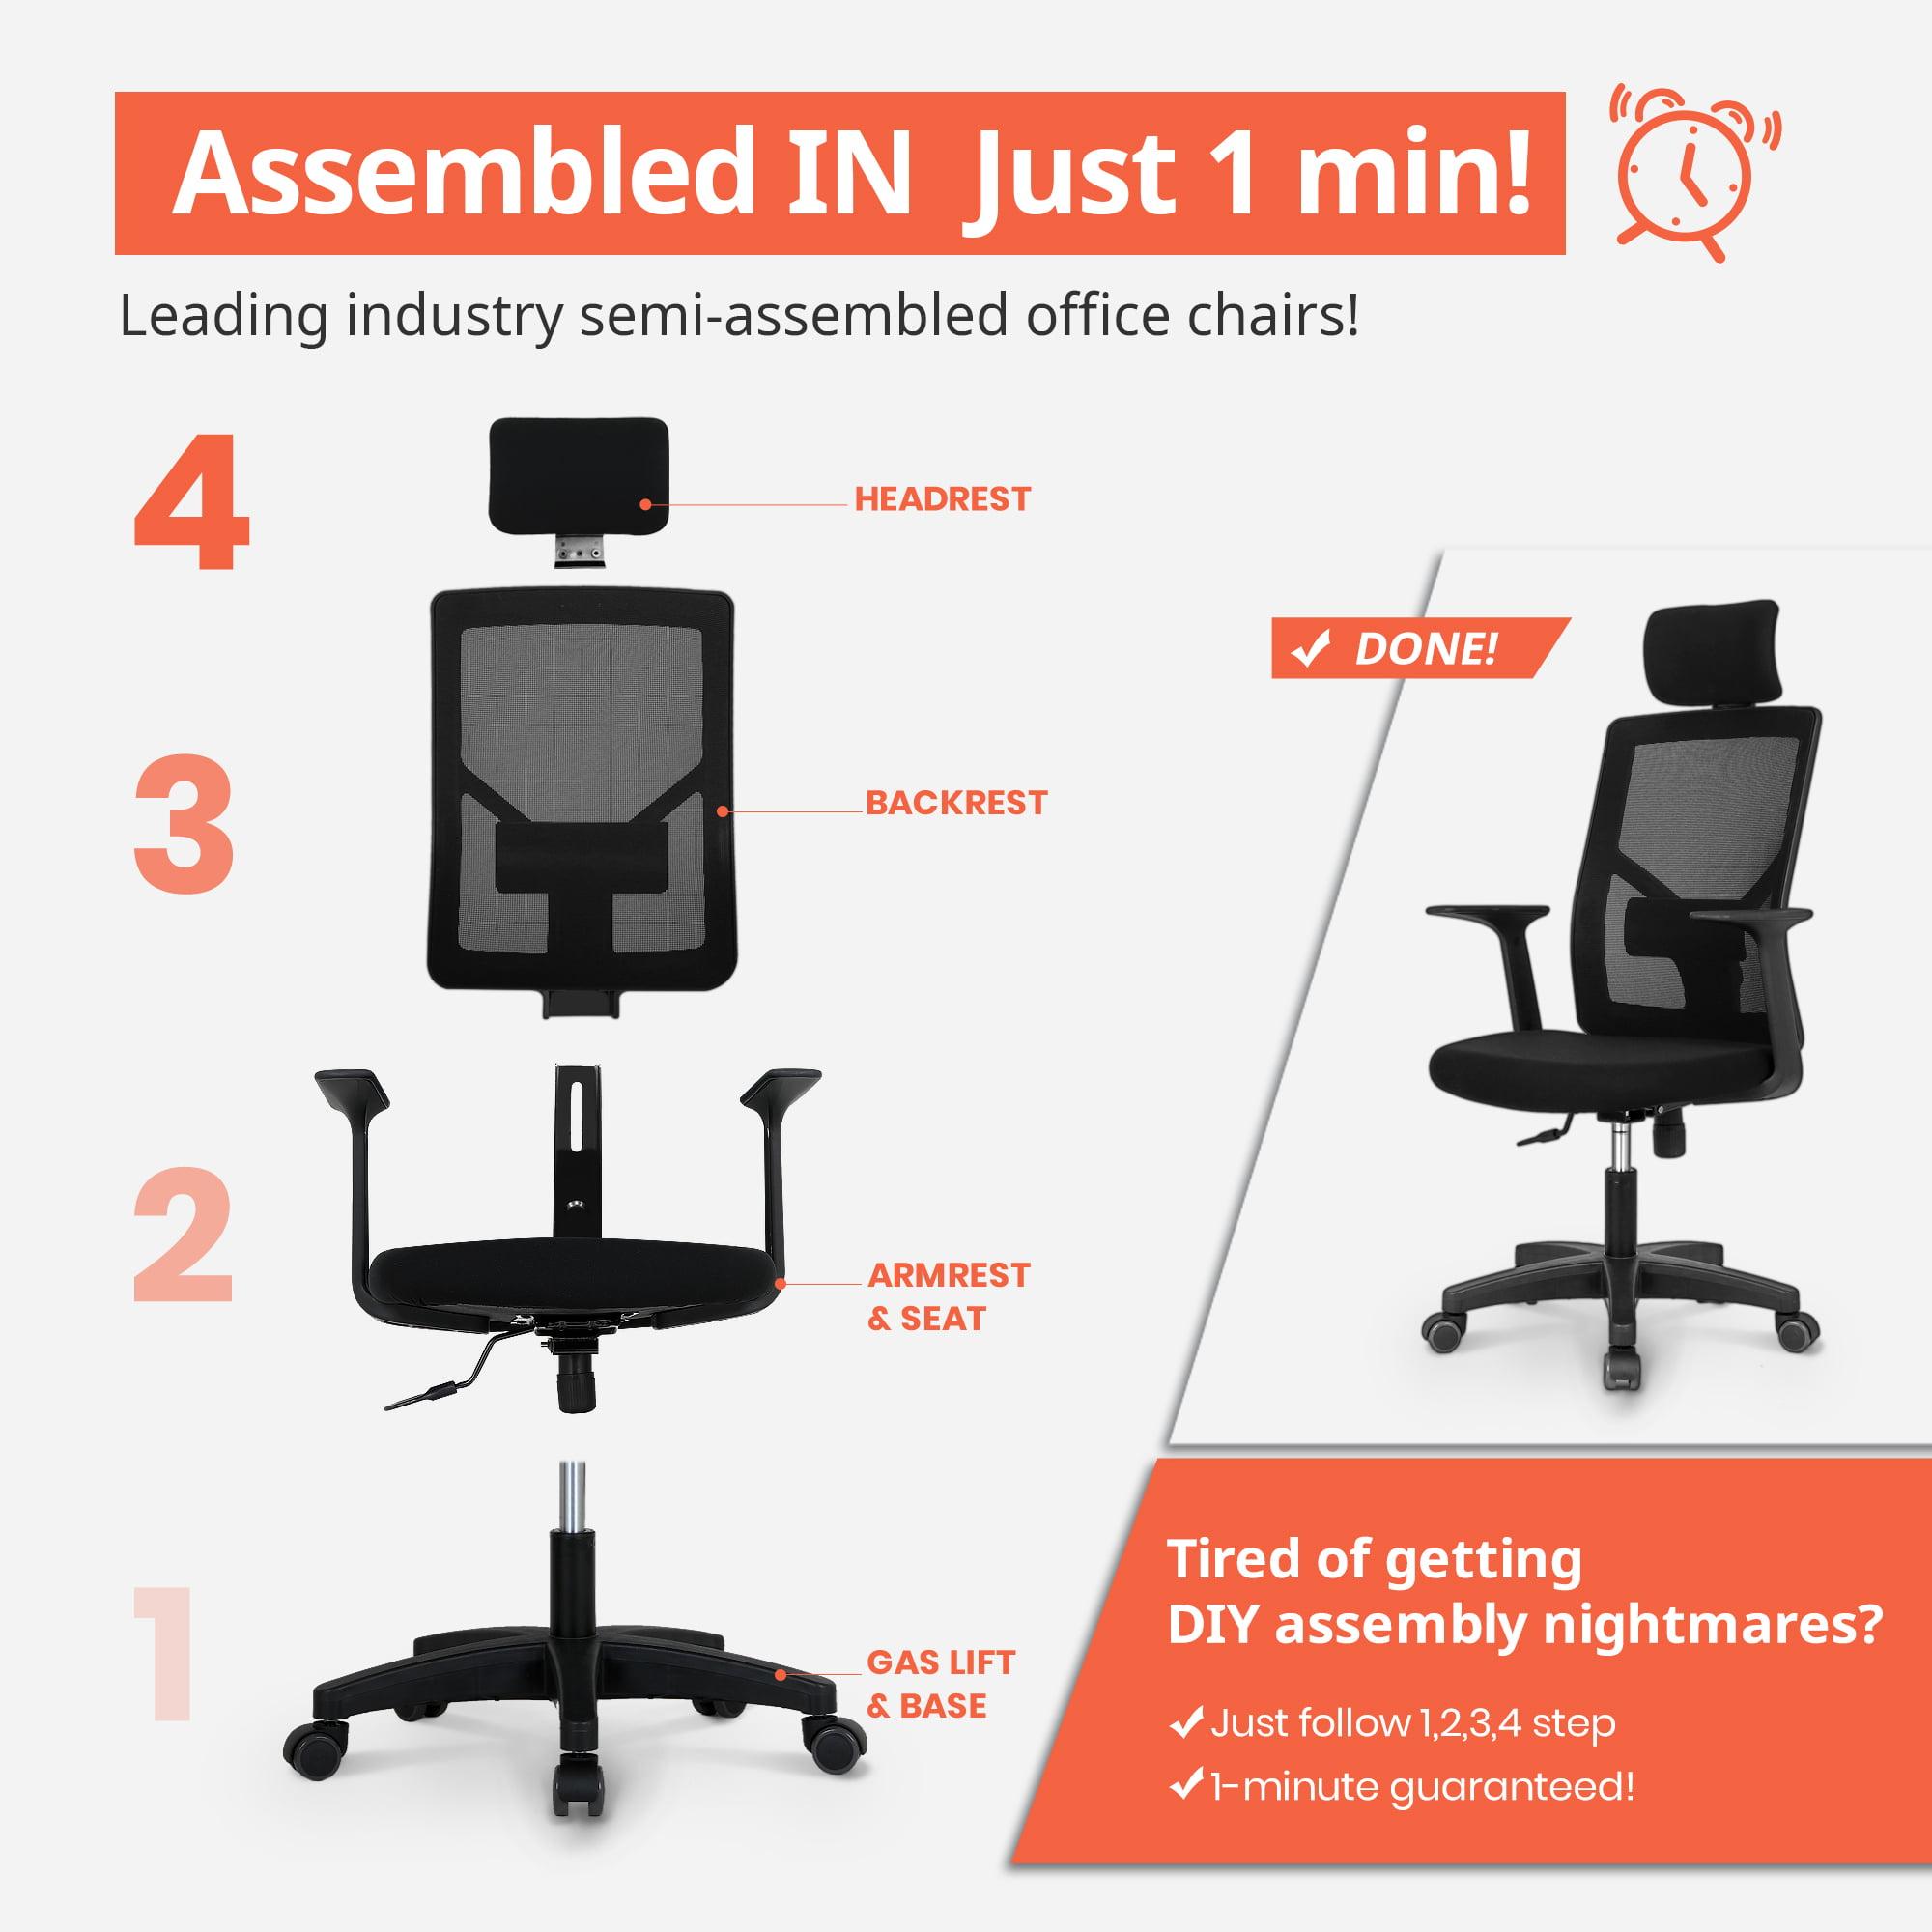 Neo Chair Light Mesh Office Chair Black Ms M10 Bk Walmart Com Walmart Com